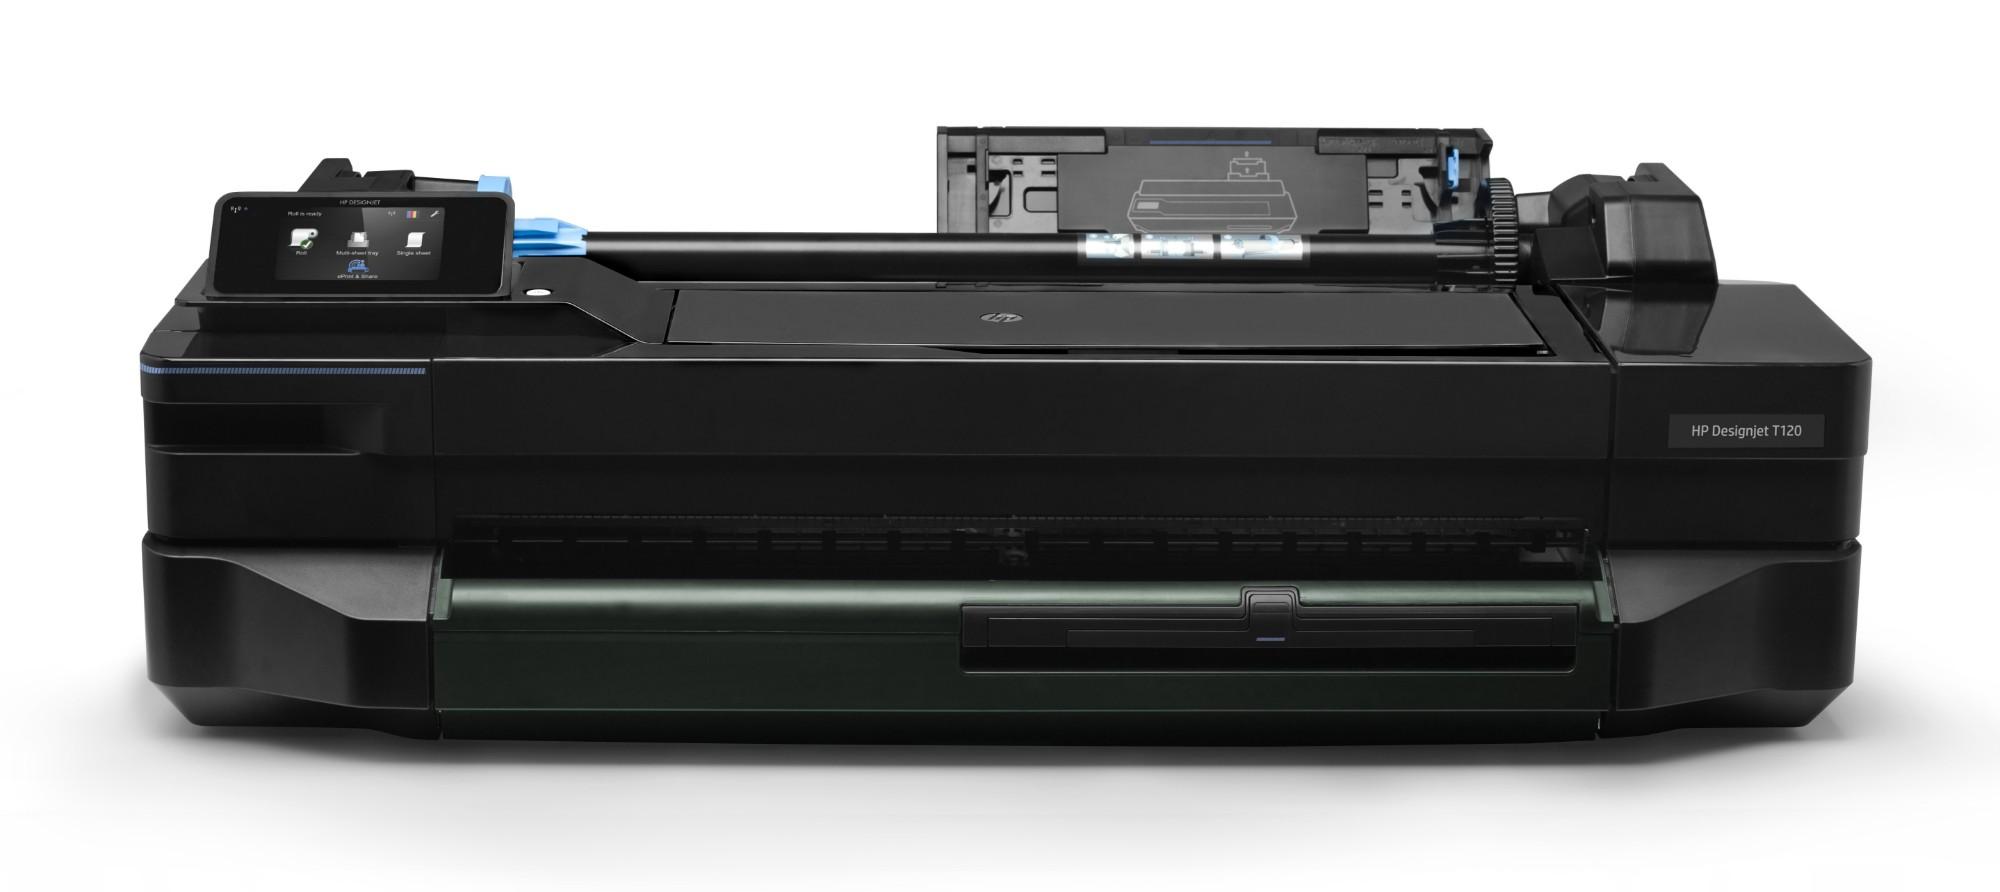 HP Designjet T120 large format printer Colour 1200 x 1200 DPI Thermal inkjet 610 x 1897 mm Wi-Fi